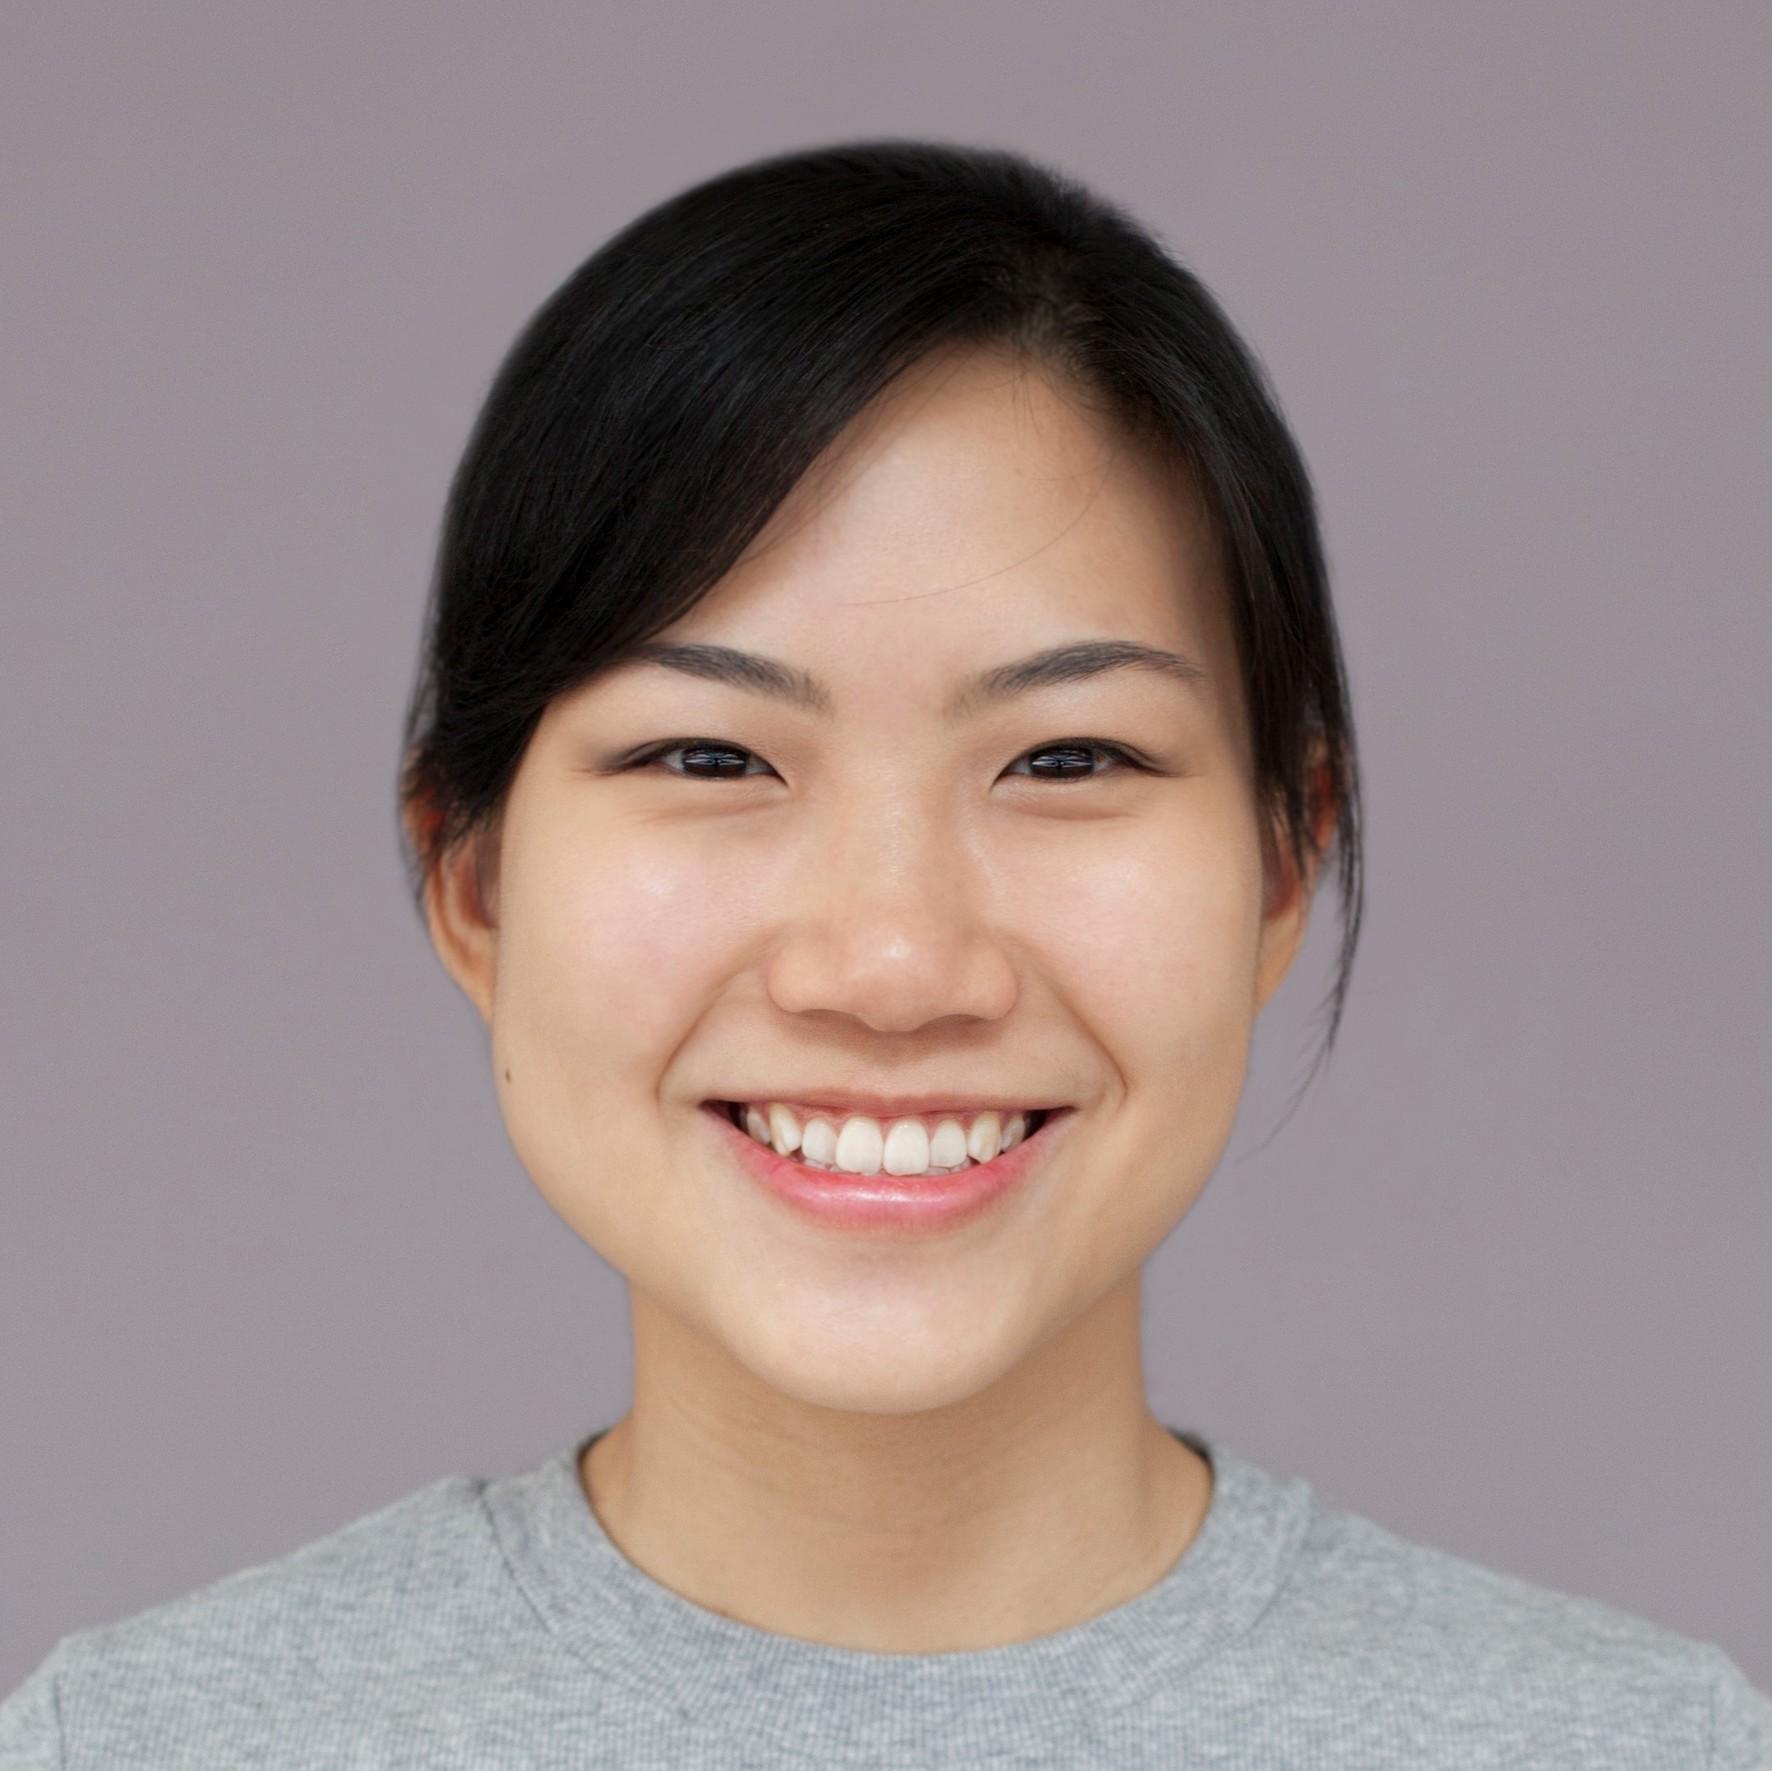 Geraldine Quek Cai Ting